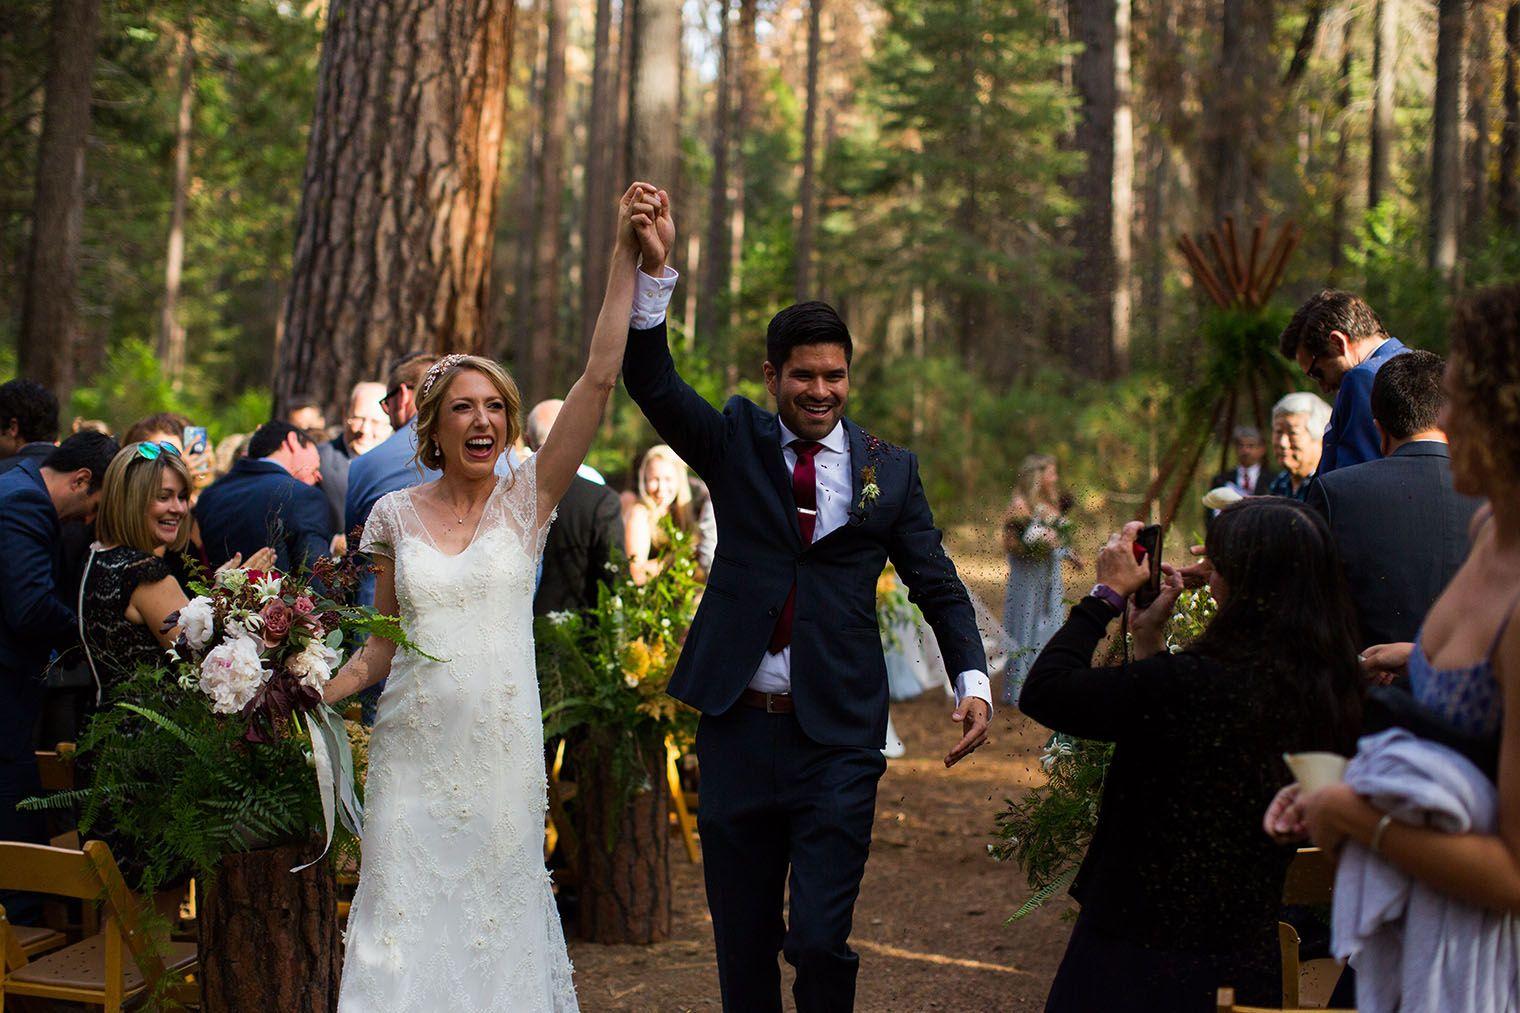 Evergreen Lodge Wedding in Yosemite National Park